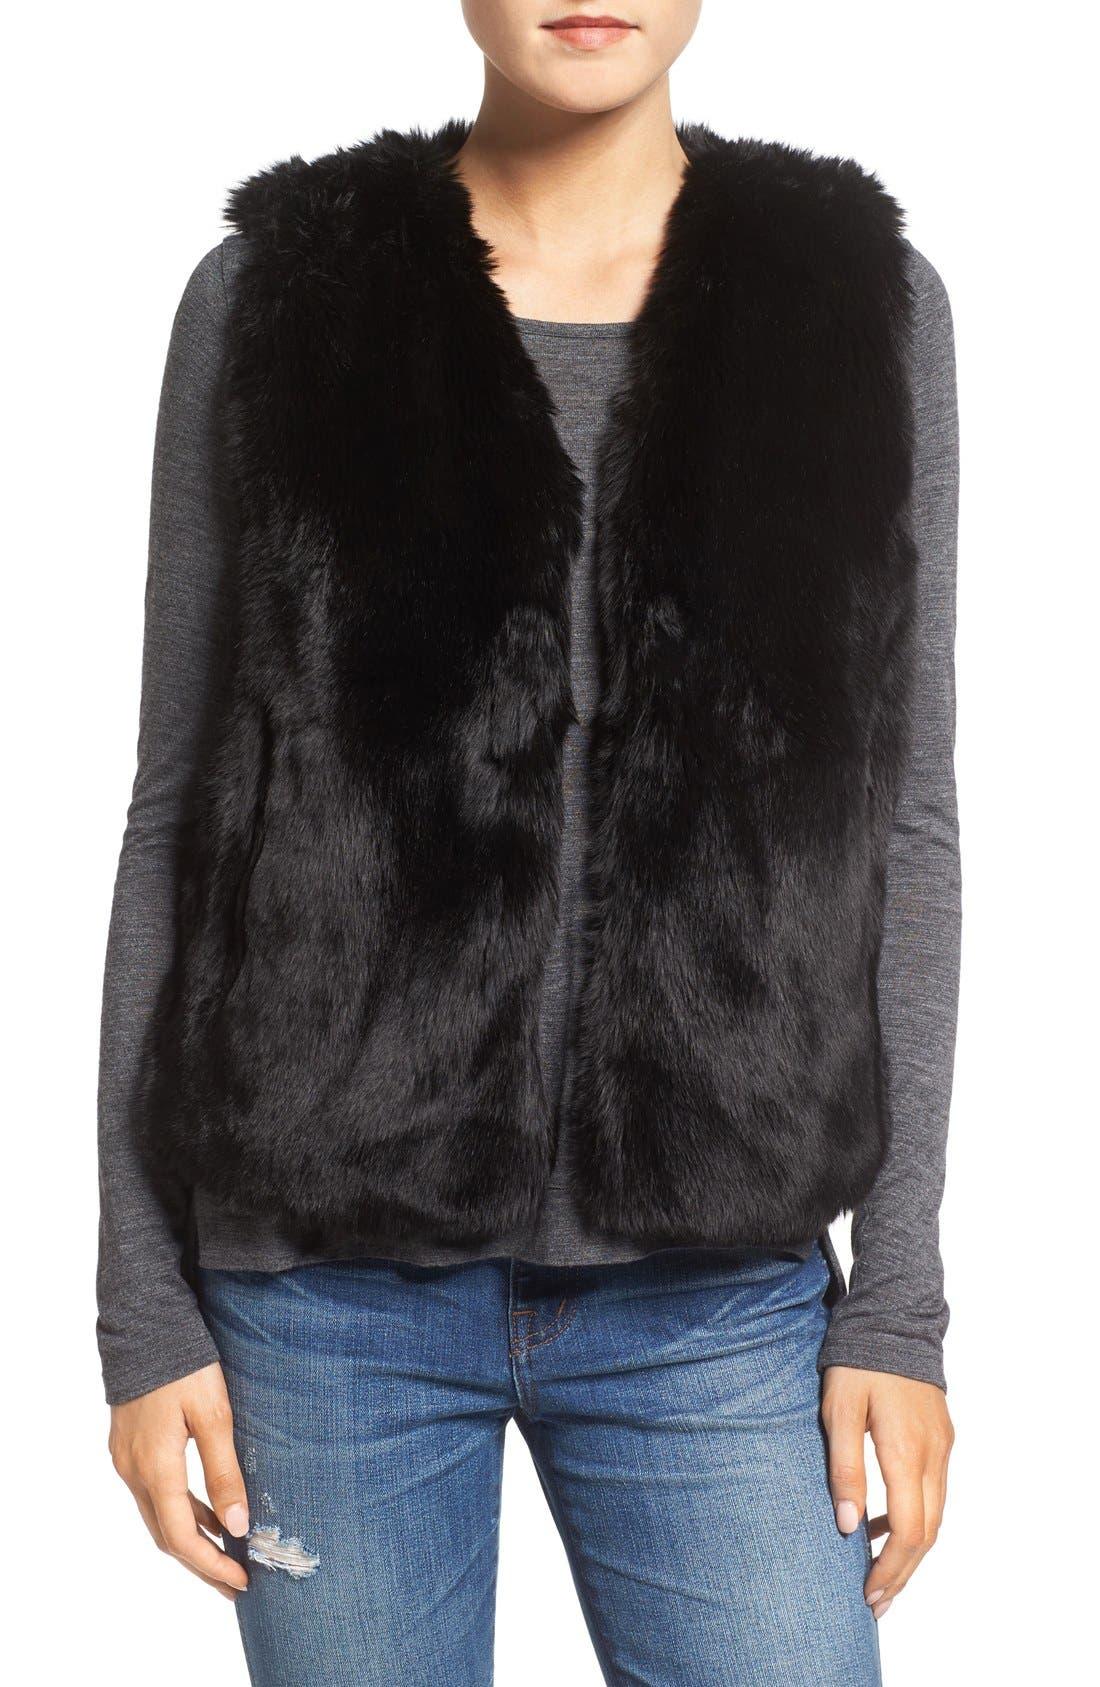 Alternate Image 1 Selected - Madewell Faux Fur Vest